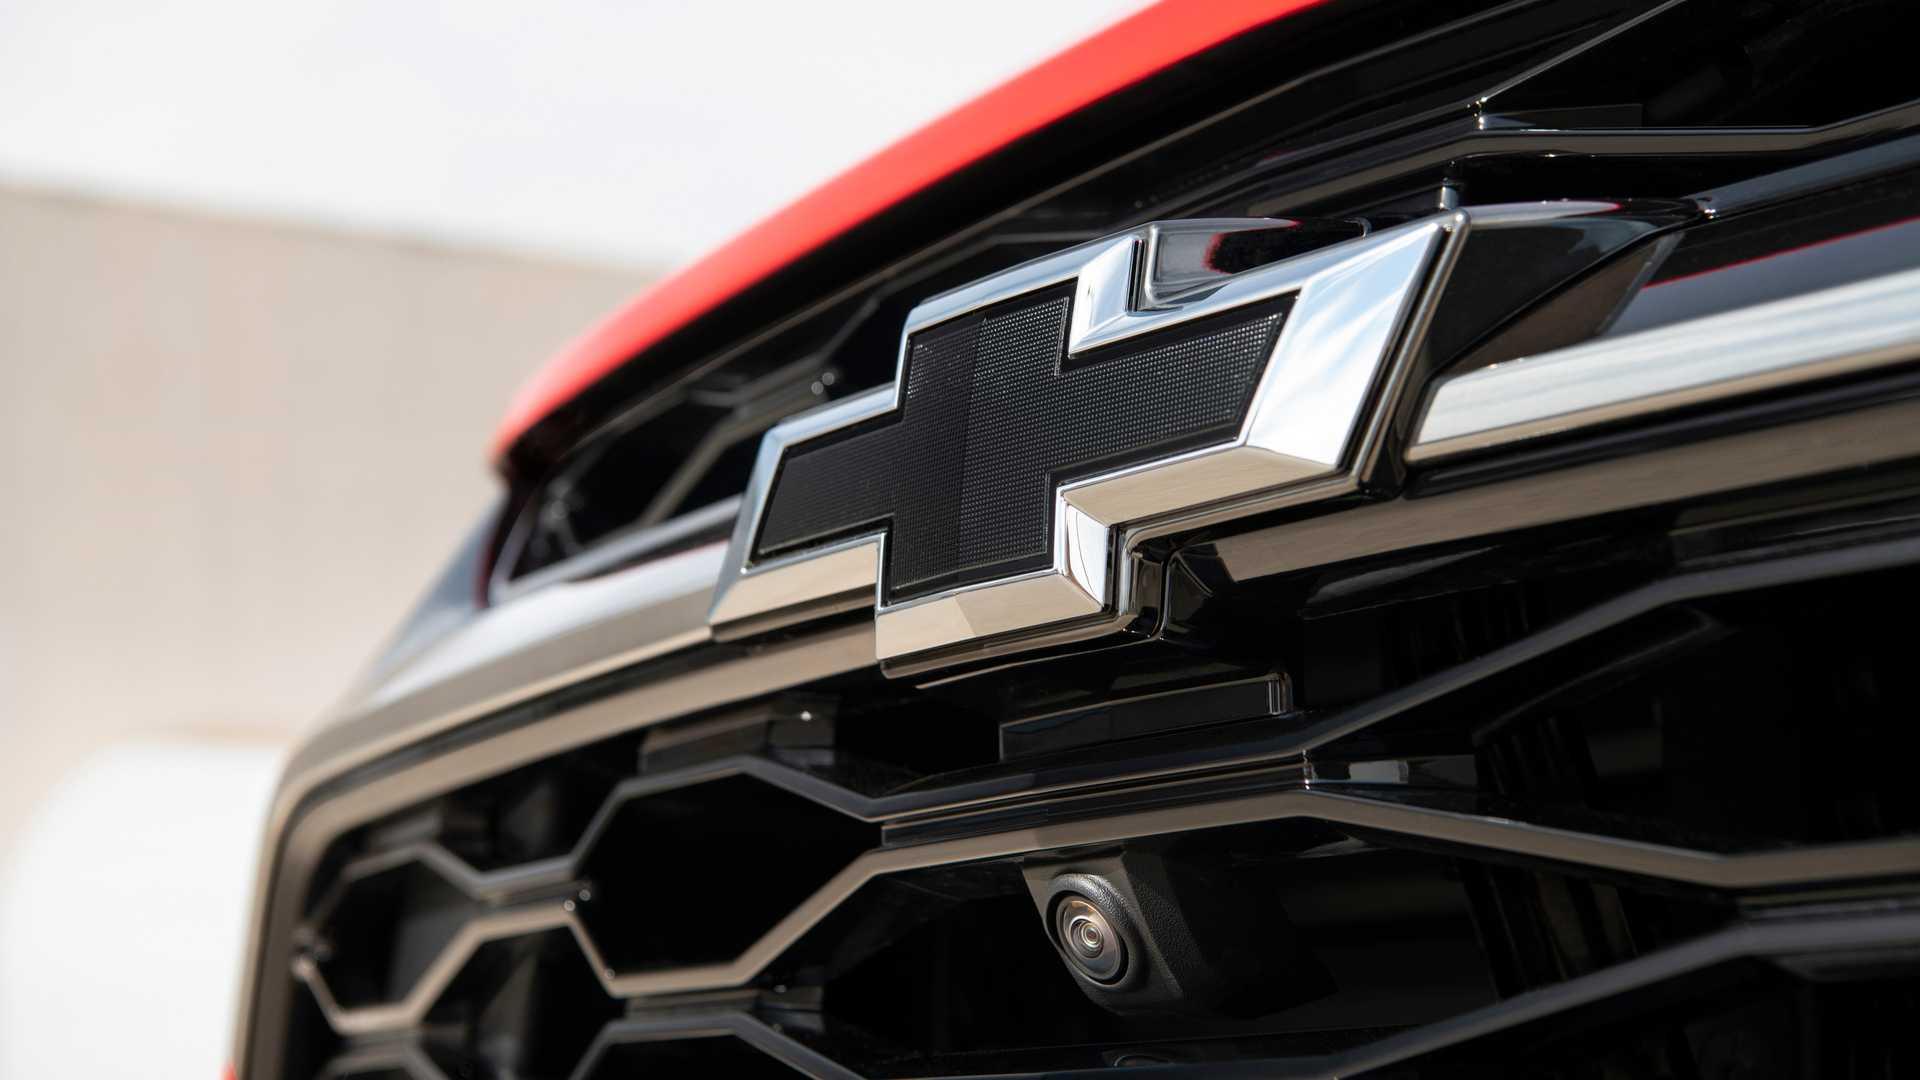 2019-chevrolet-blazer-first-drive-danh-gia-10.jpg